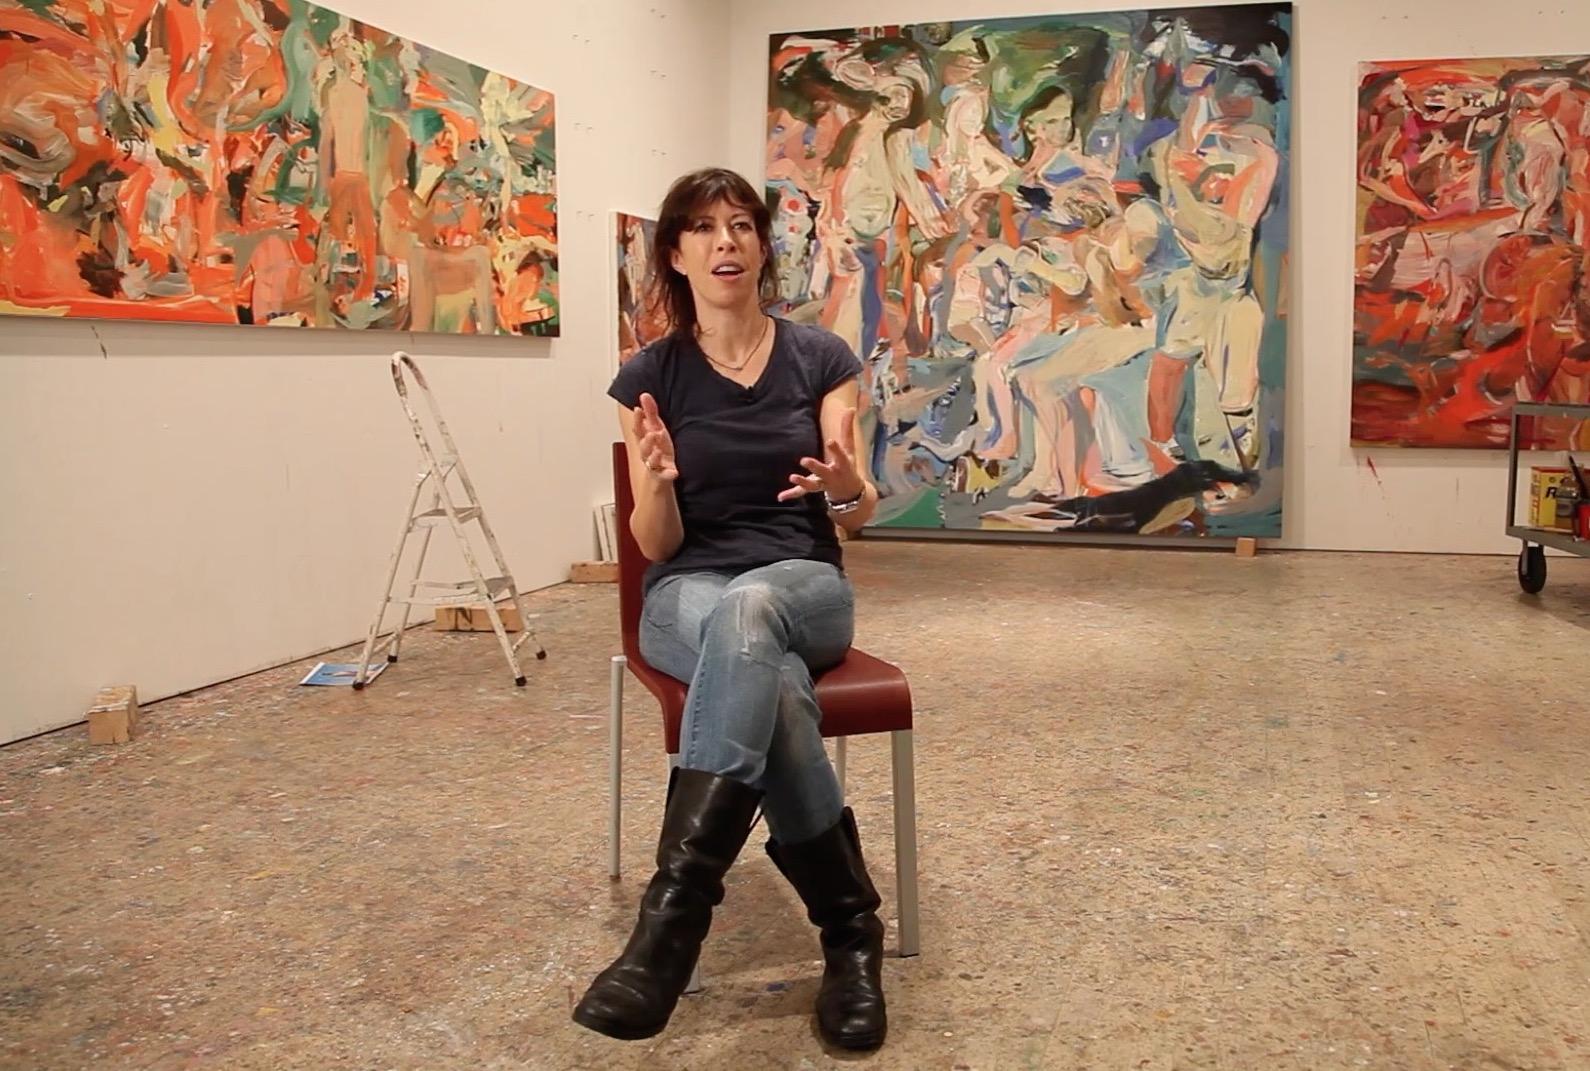 Pittura Moderna Americana.Cos E La Pittura Oggi Otto Artisti Rispondono Artribune